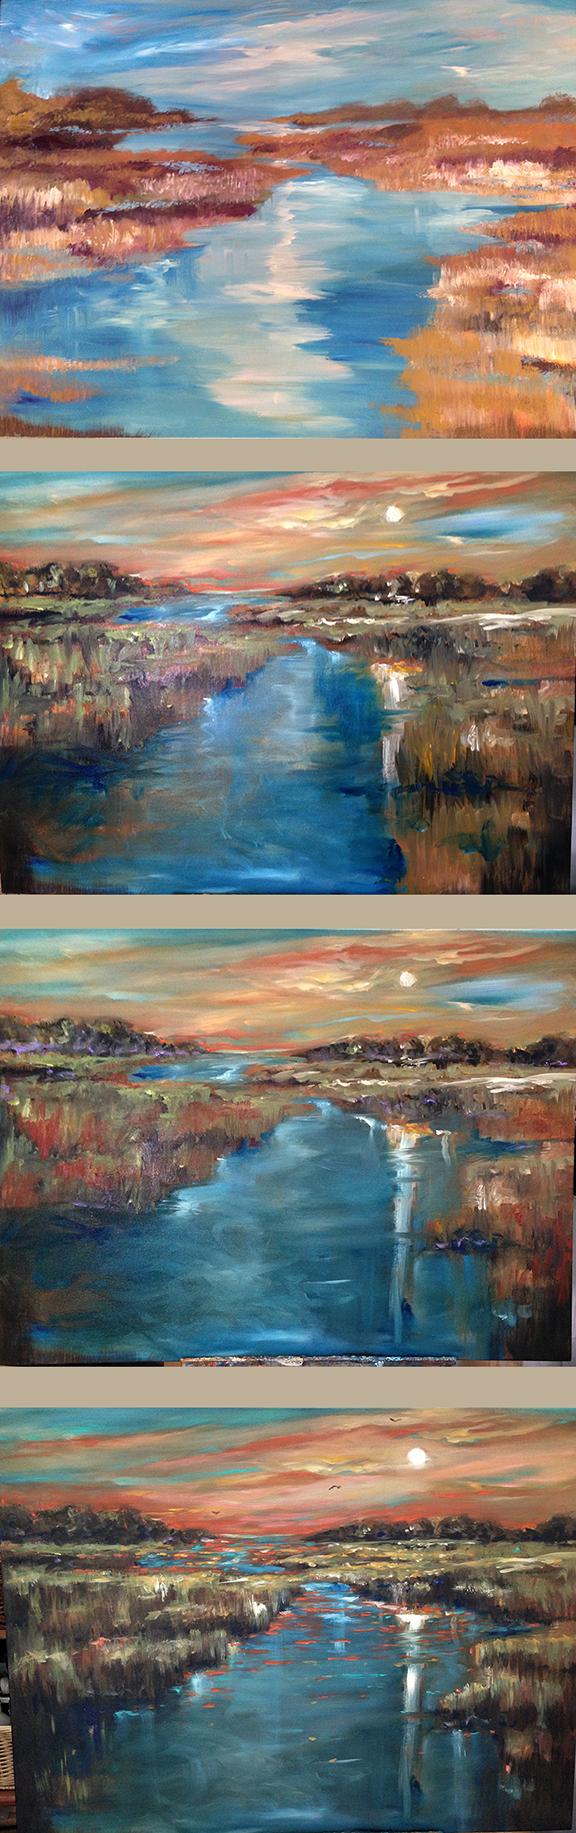 Waterway sunset progression